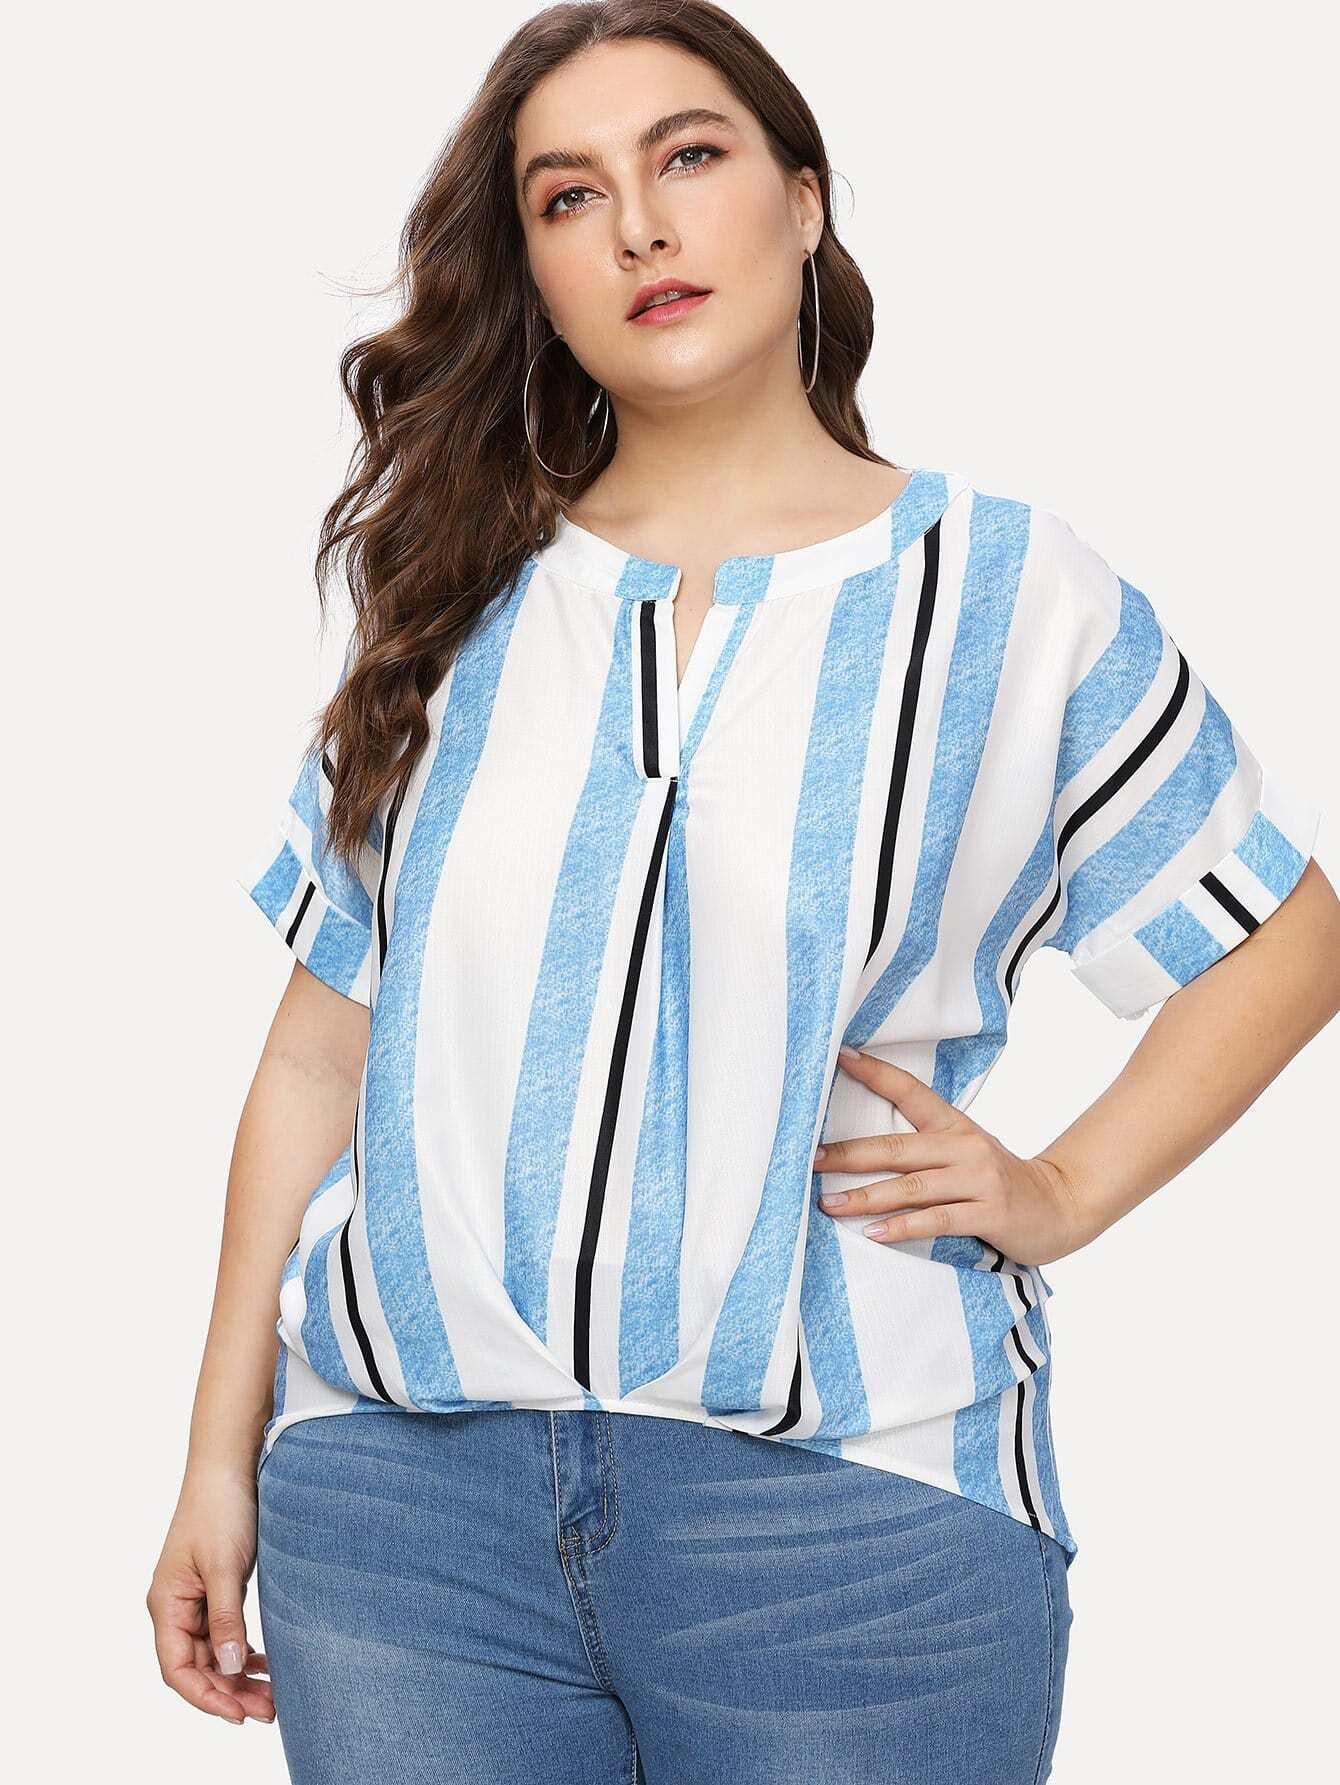 Dip Hem Striped Blouse all over cranes print dip hem striped blouse